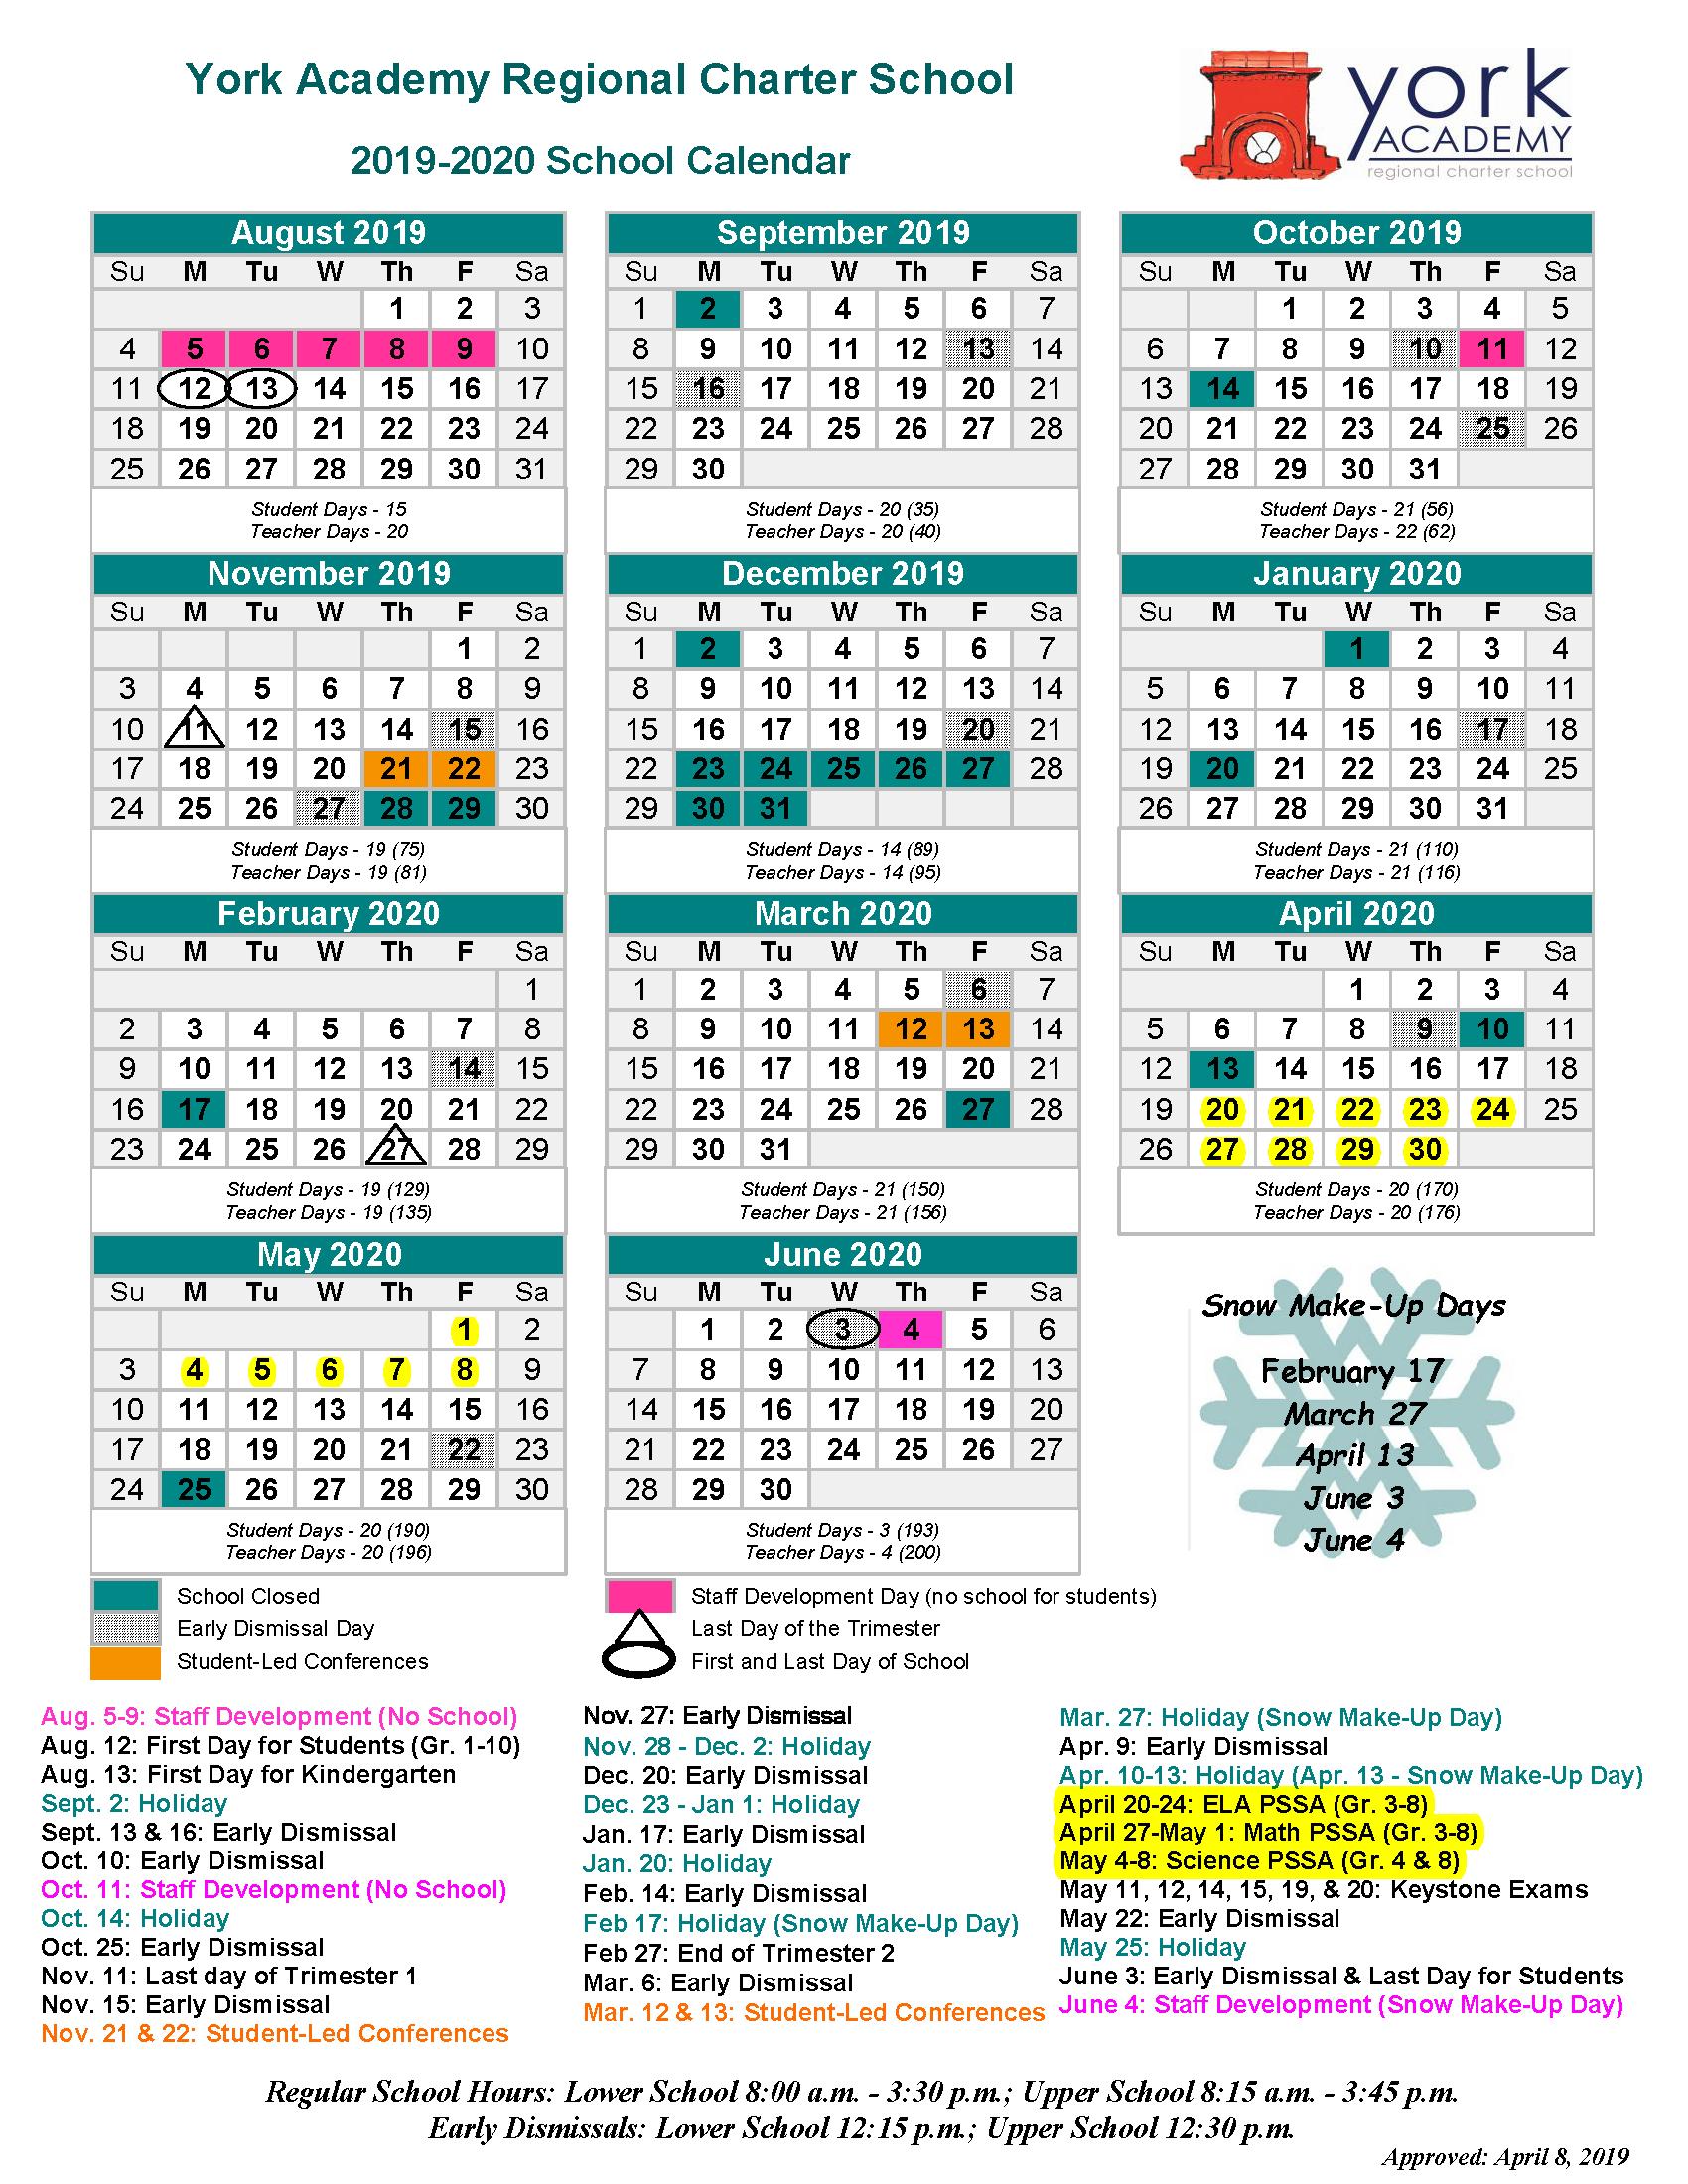 School Calendar (Pdf) - York Academy Regional Charter School Inside Mifflin County School District Calender 20 21